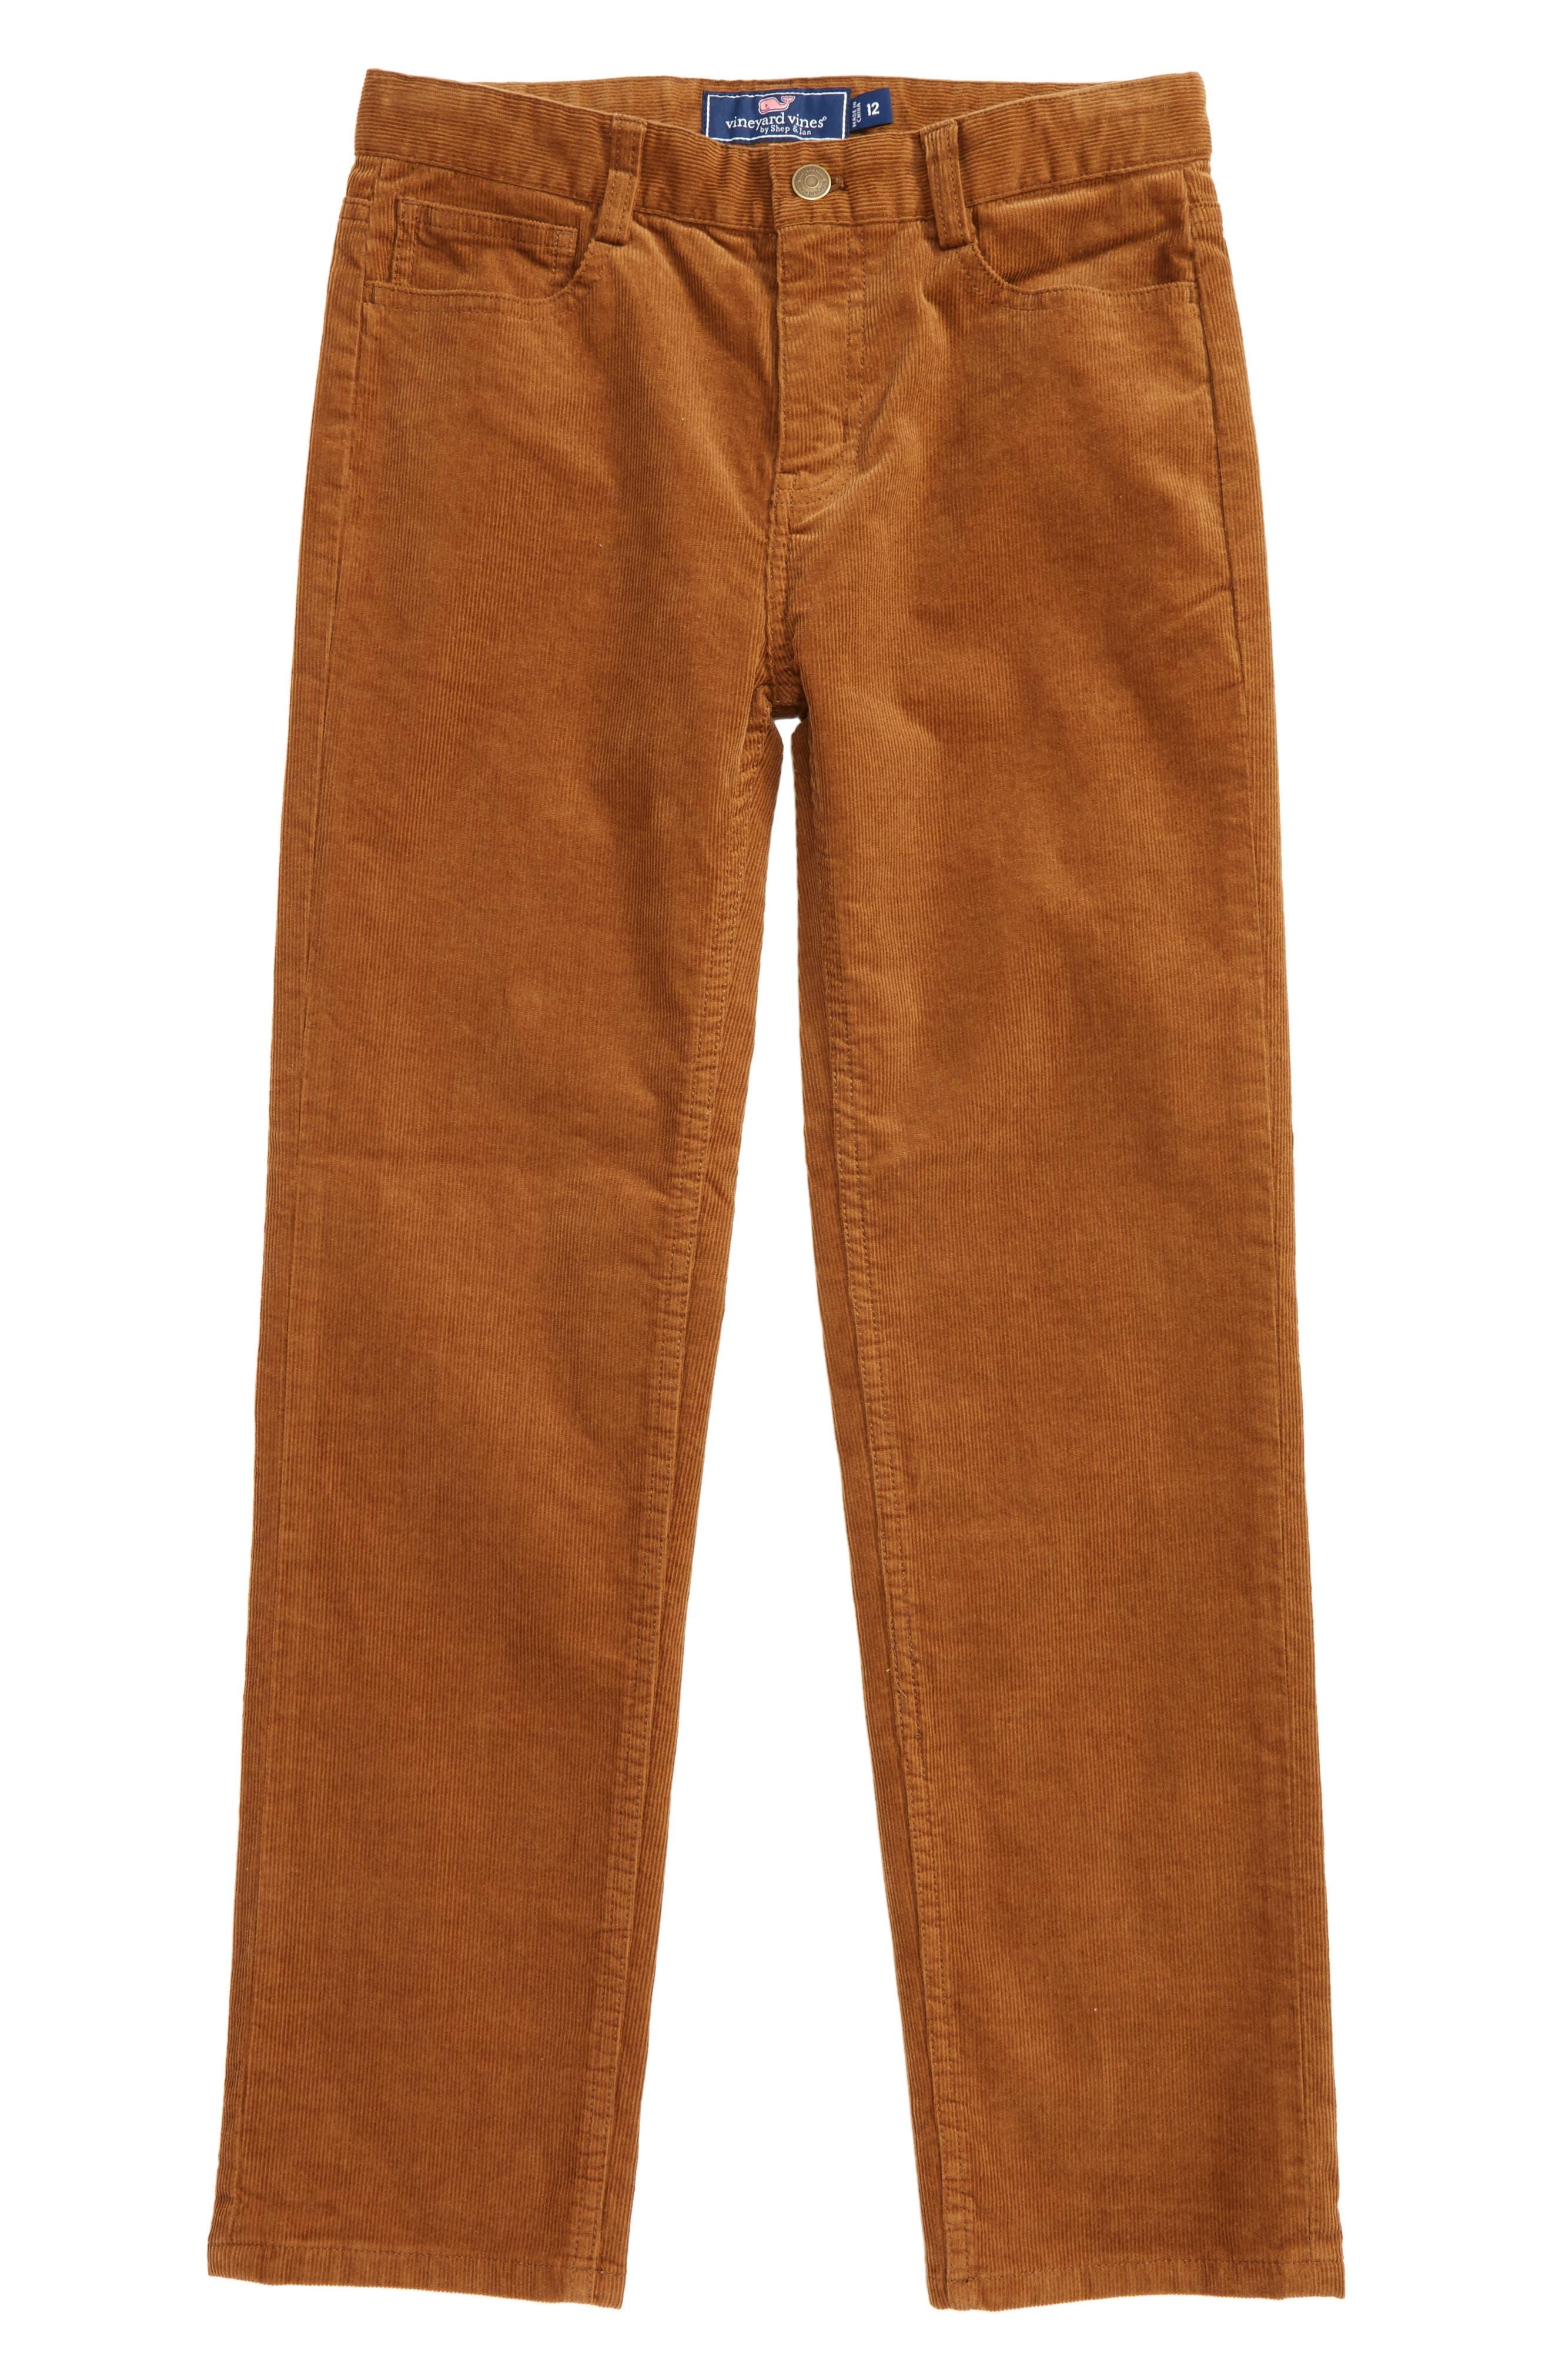 Boys Brown Corduroy Pants XvBwsWFs